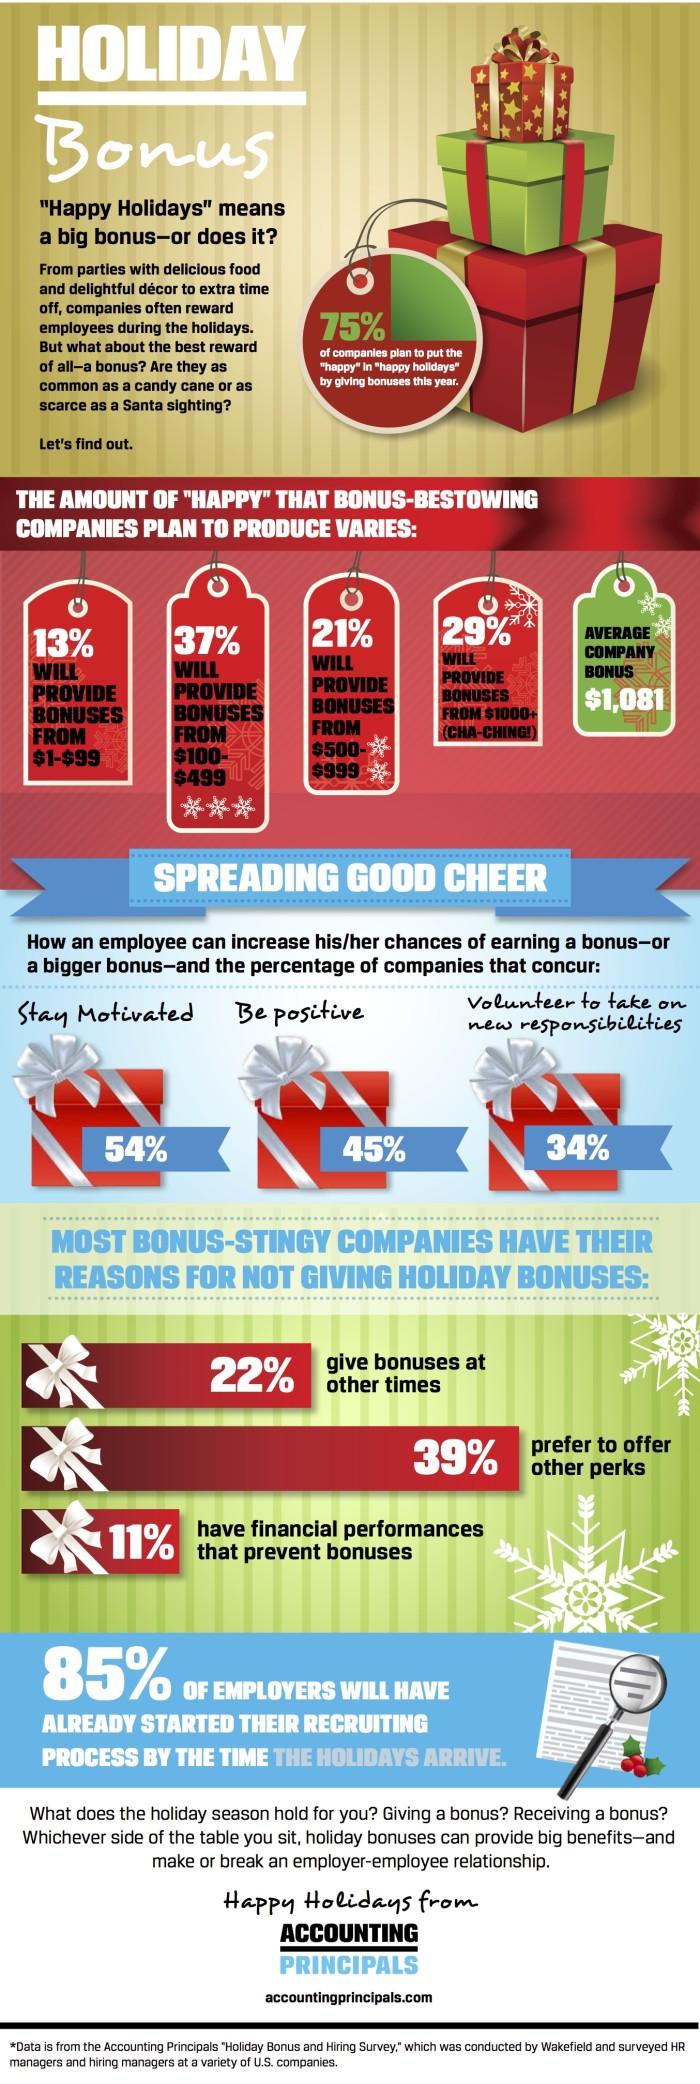 Holiday bonus survey 2016 infographic hr